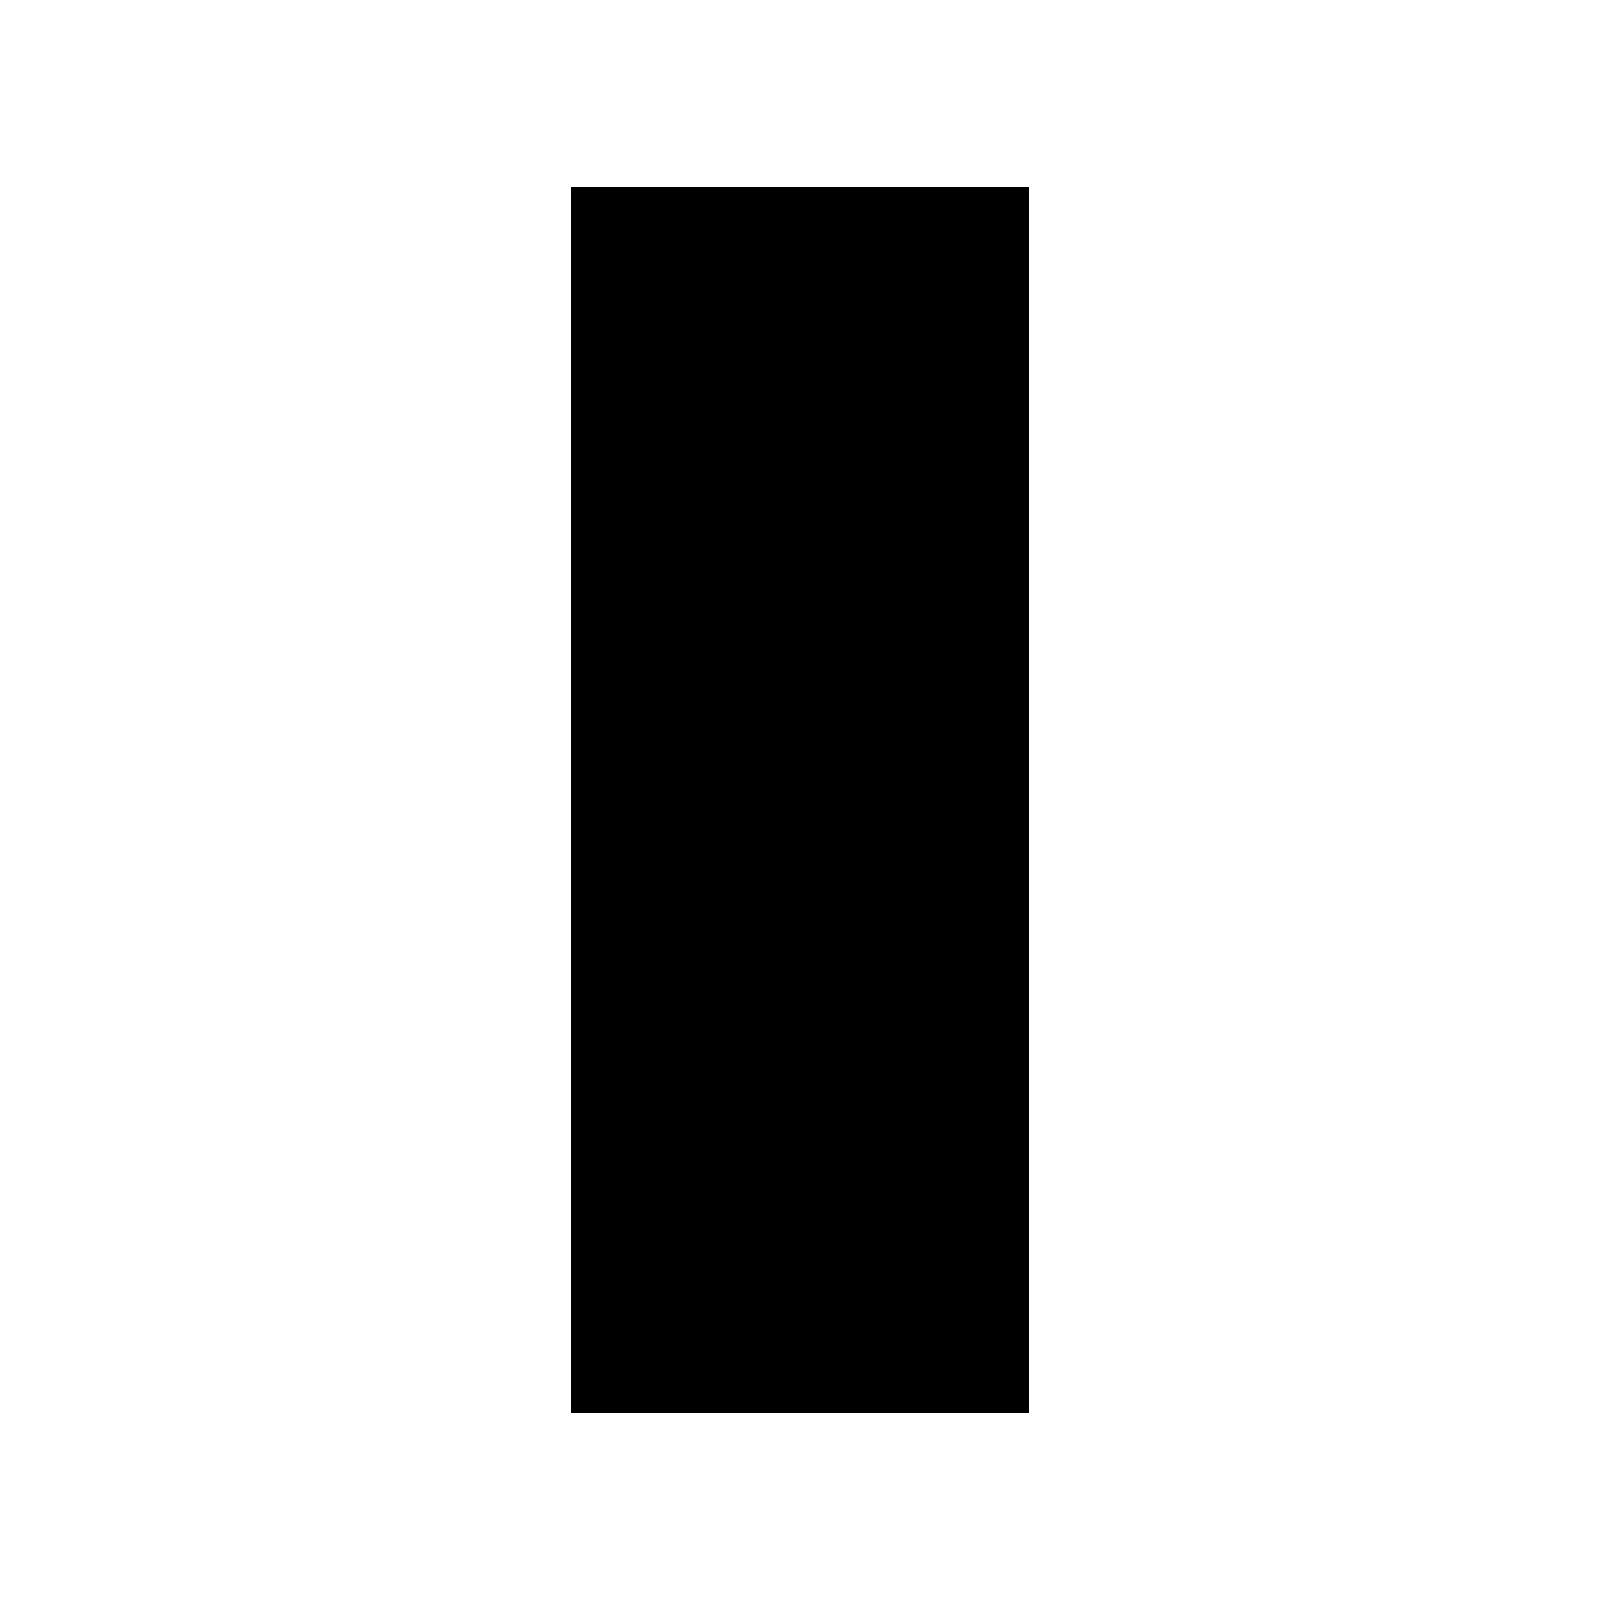 Crystalregal